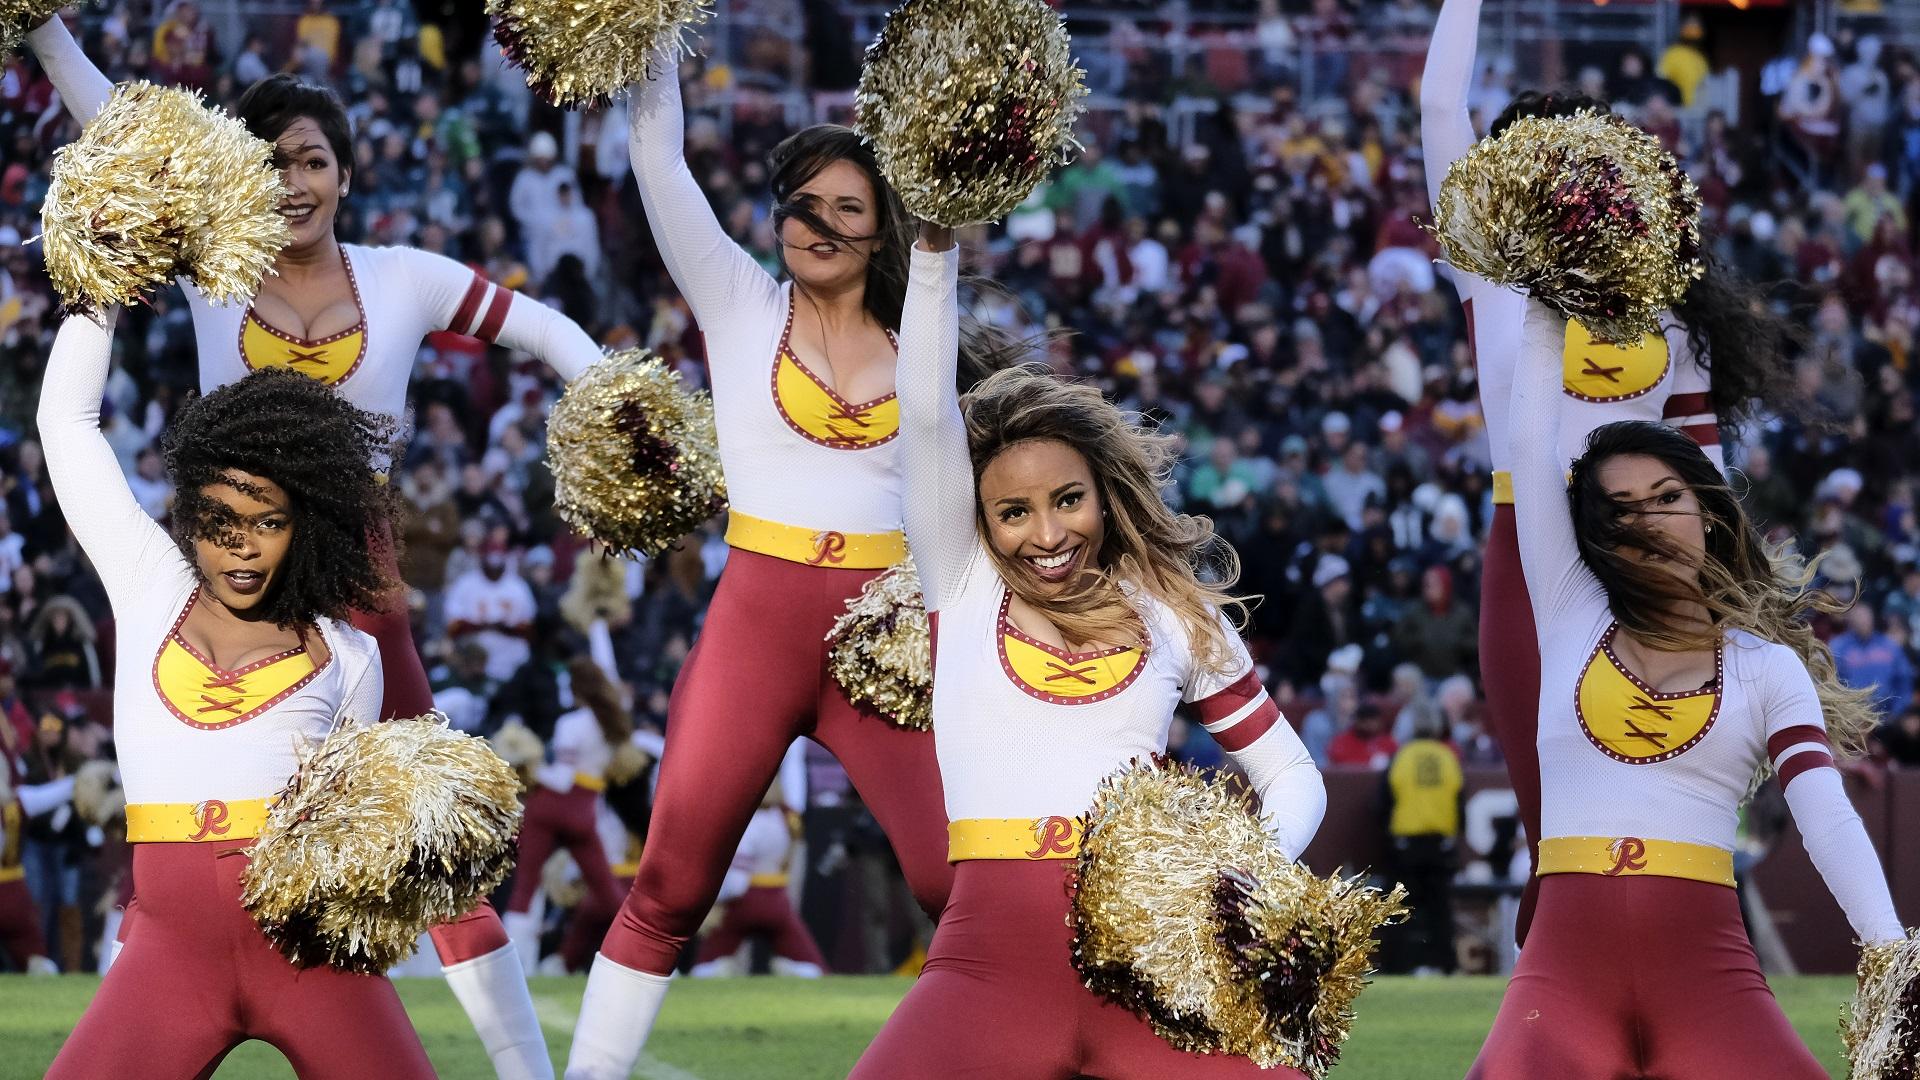 Washington replacing cheerleading team with coed dance team